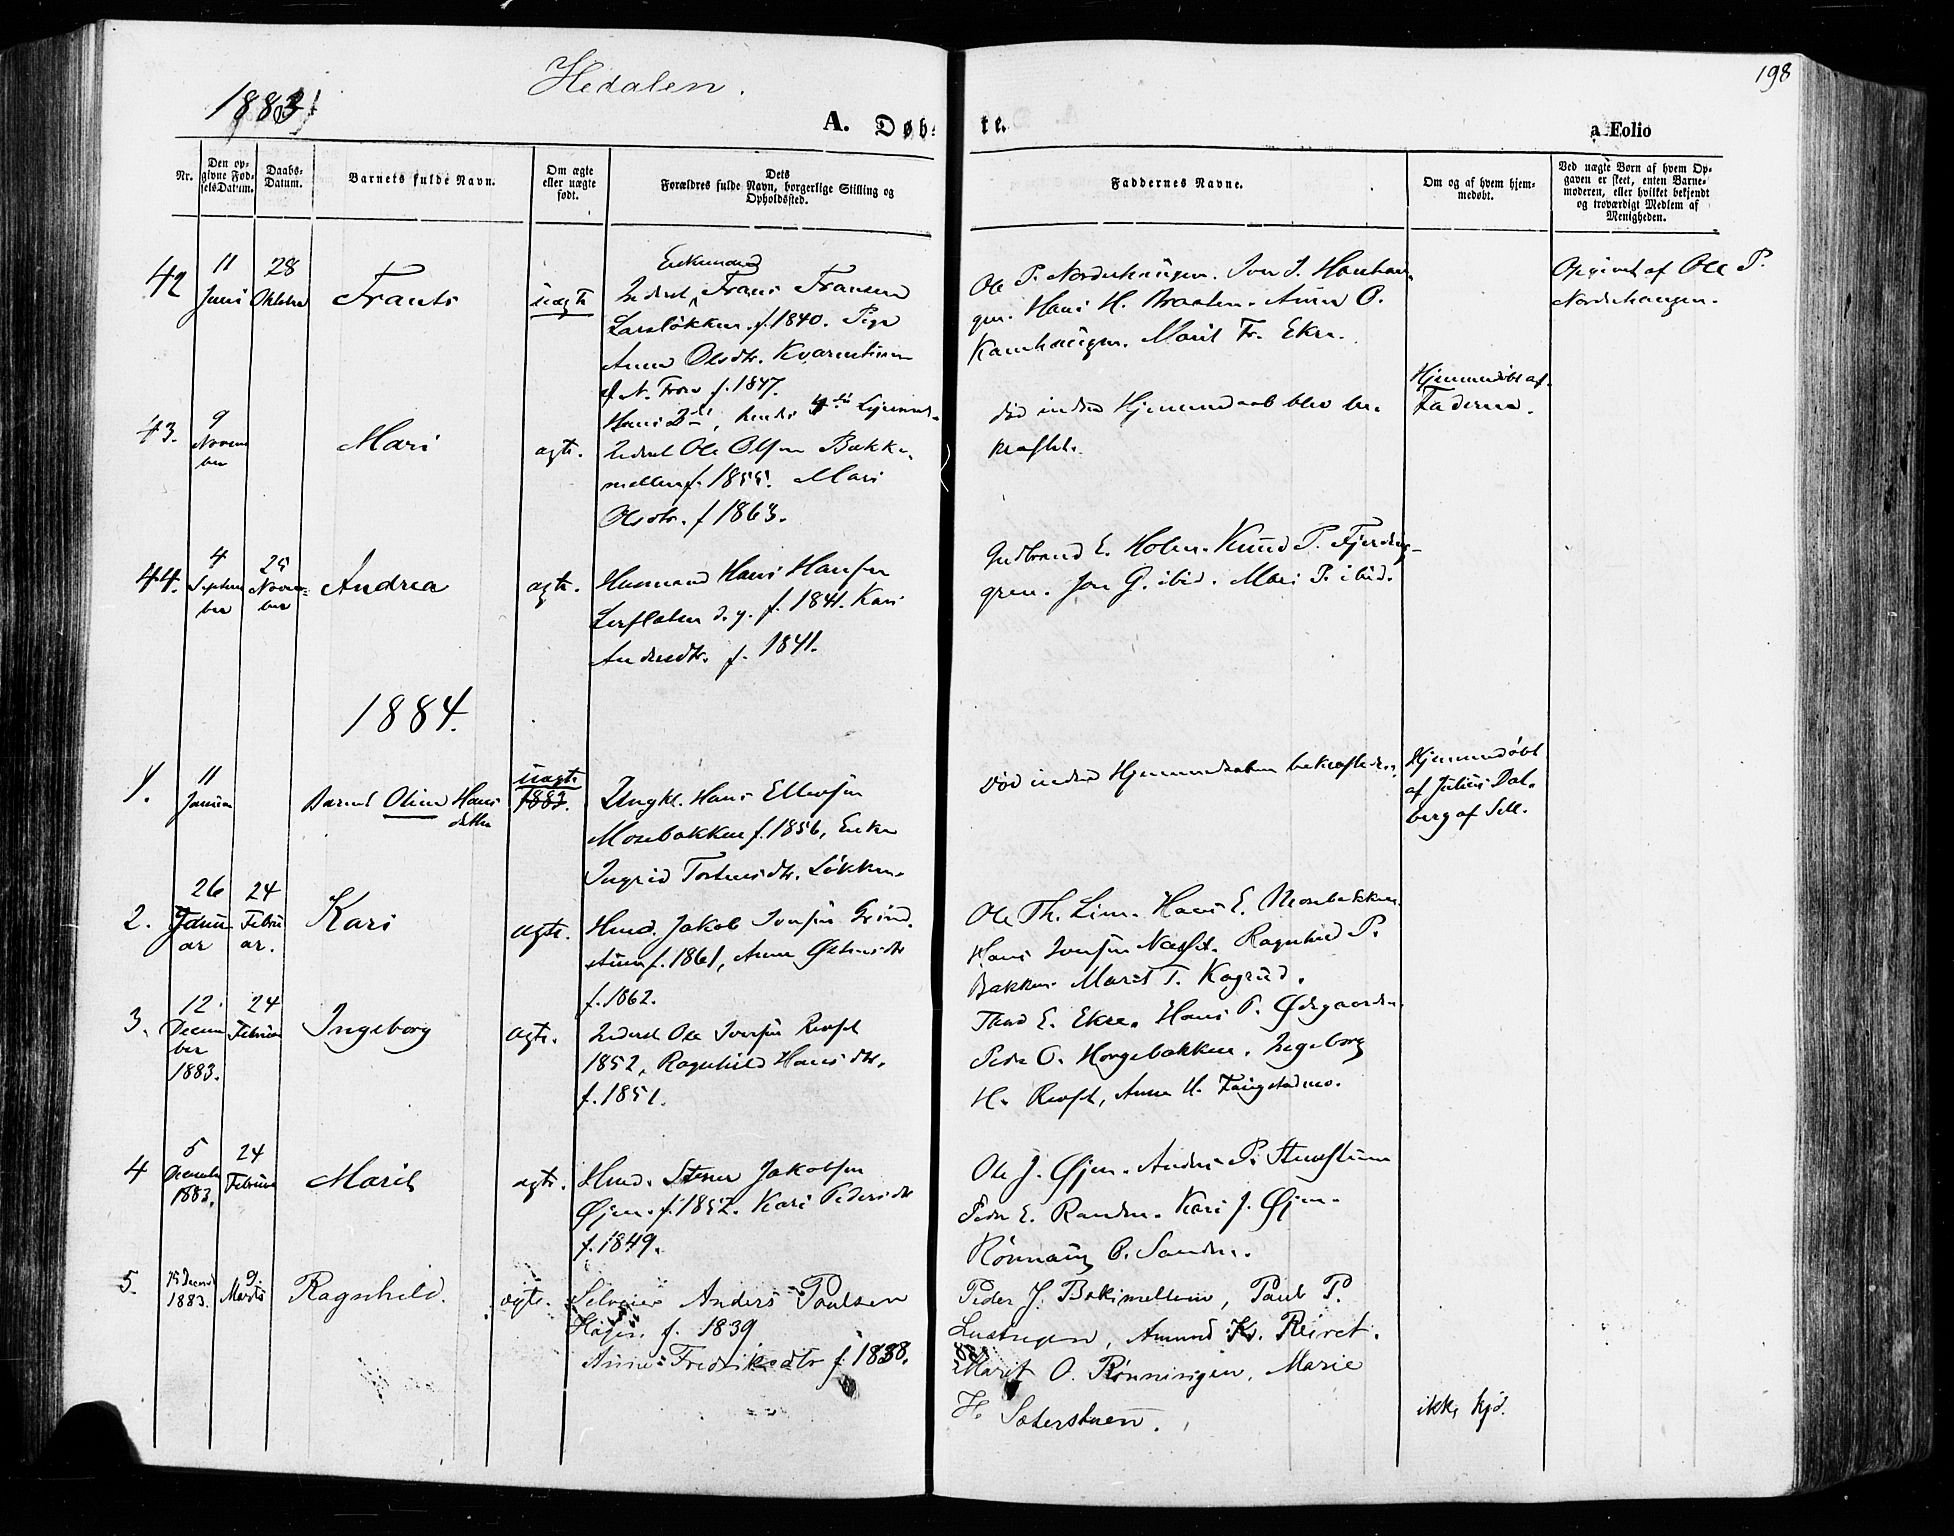 SAH, Vågå prestekontor, Ministerialbok nr. 7 /2, 1873-1886, s. 198